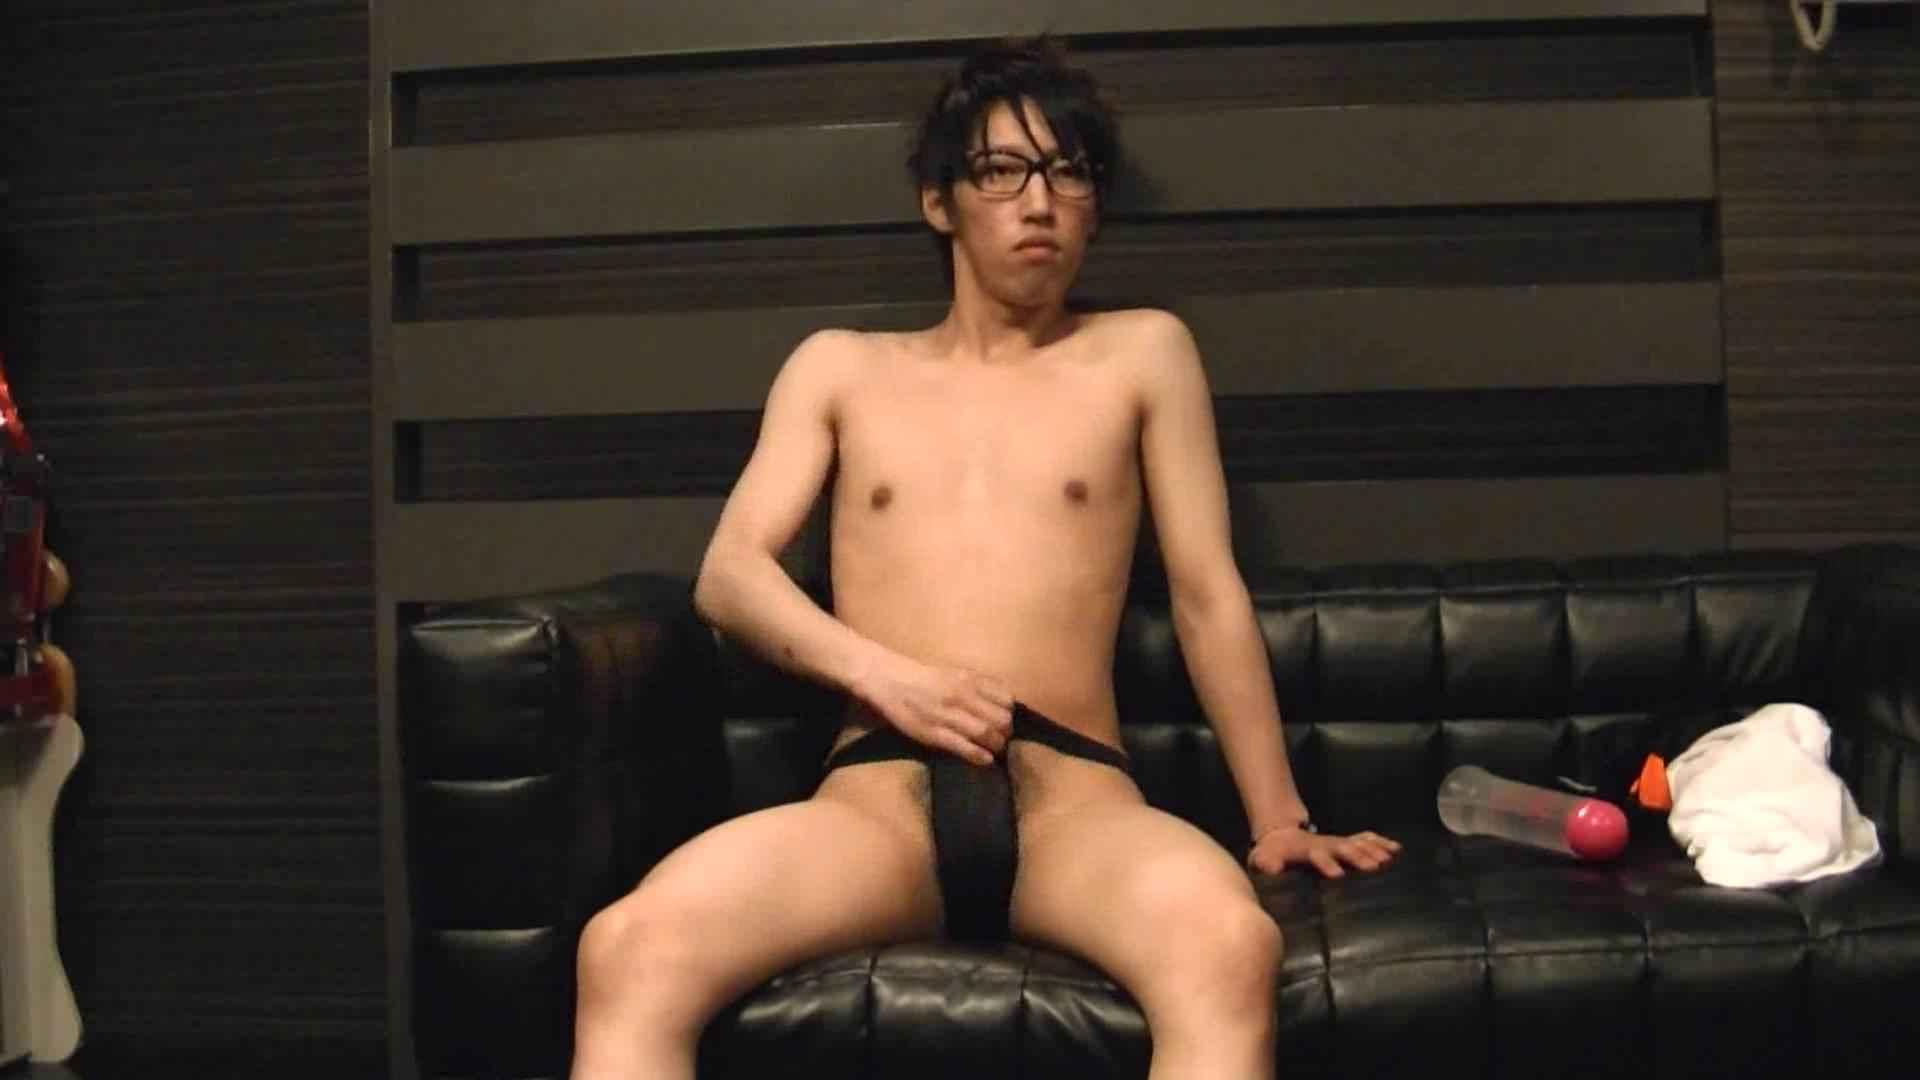 ONA見せカーニバル!! Vol3 オナニー | 男同士  11枚 5